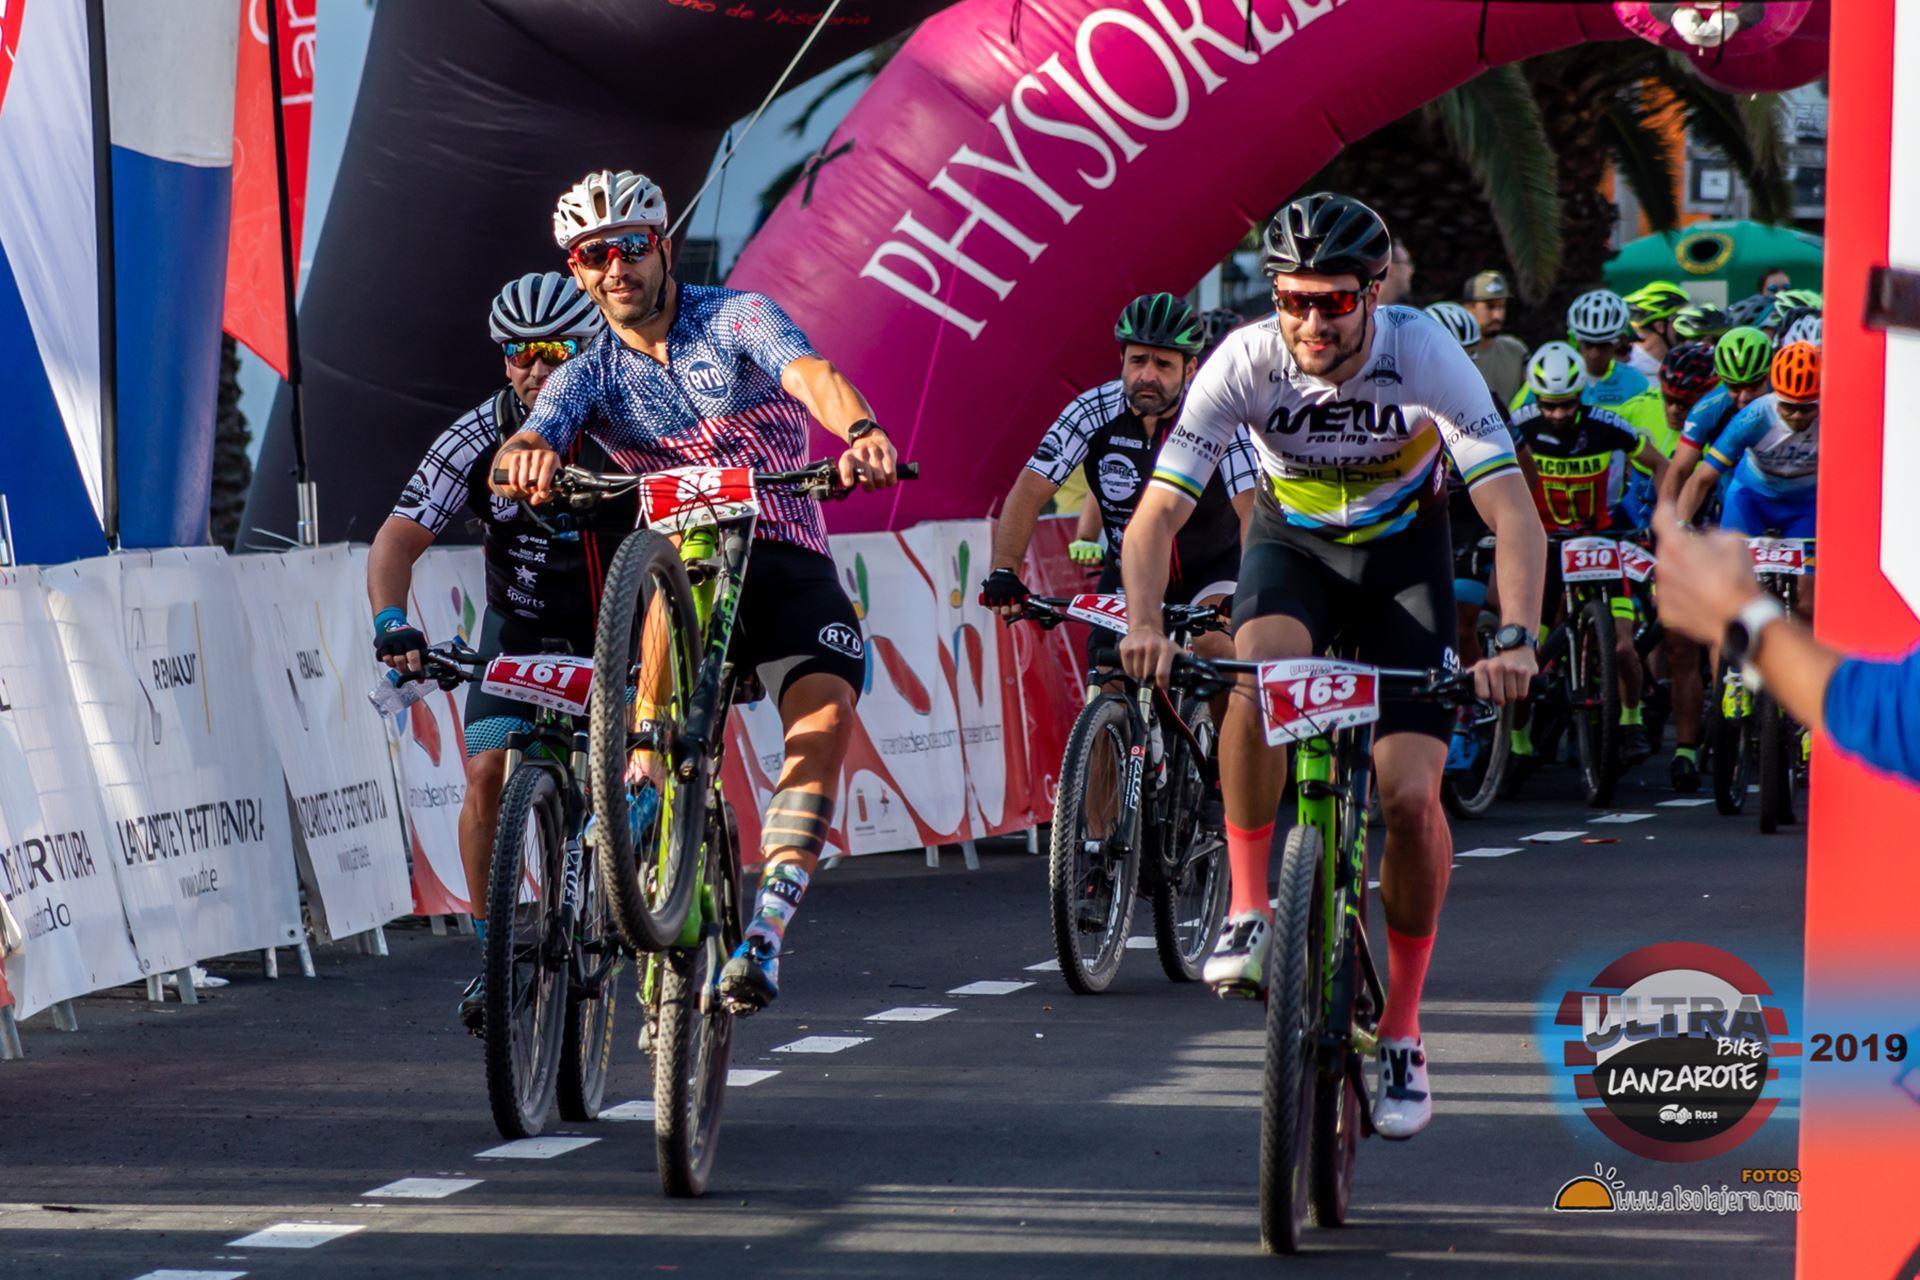 Salida 2ª Etapa Ultrabike 2019 Fotos Alsolajero.com-43